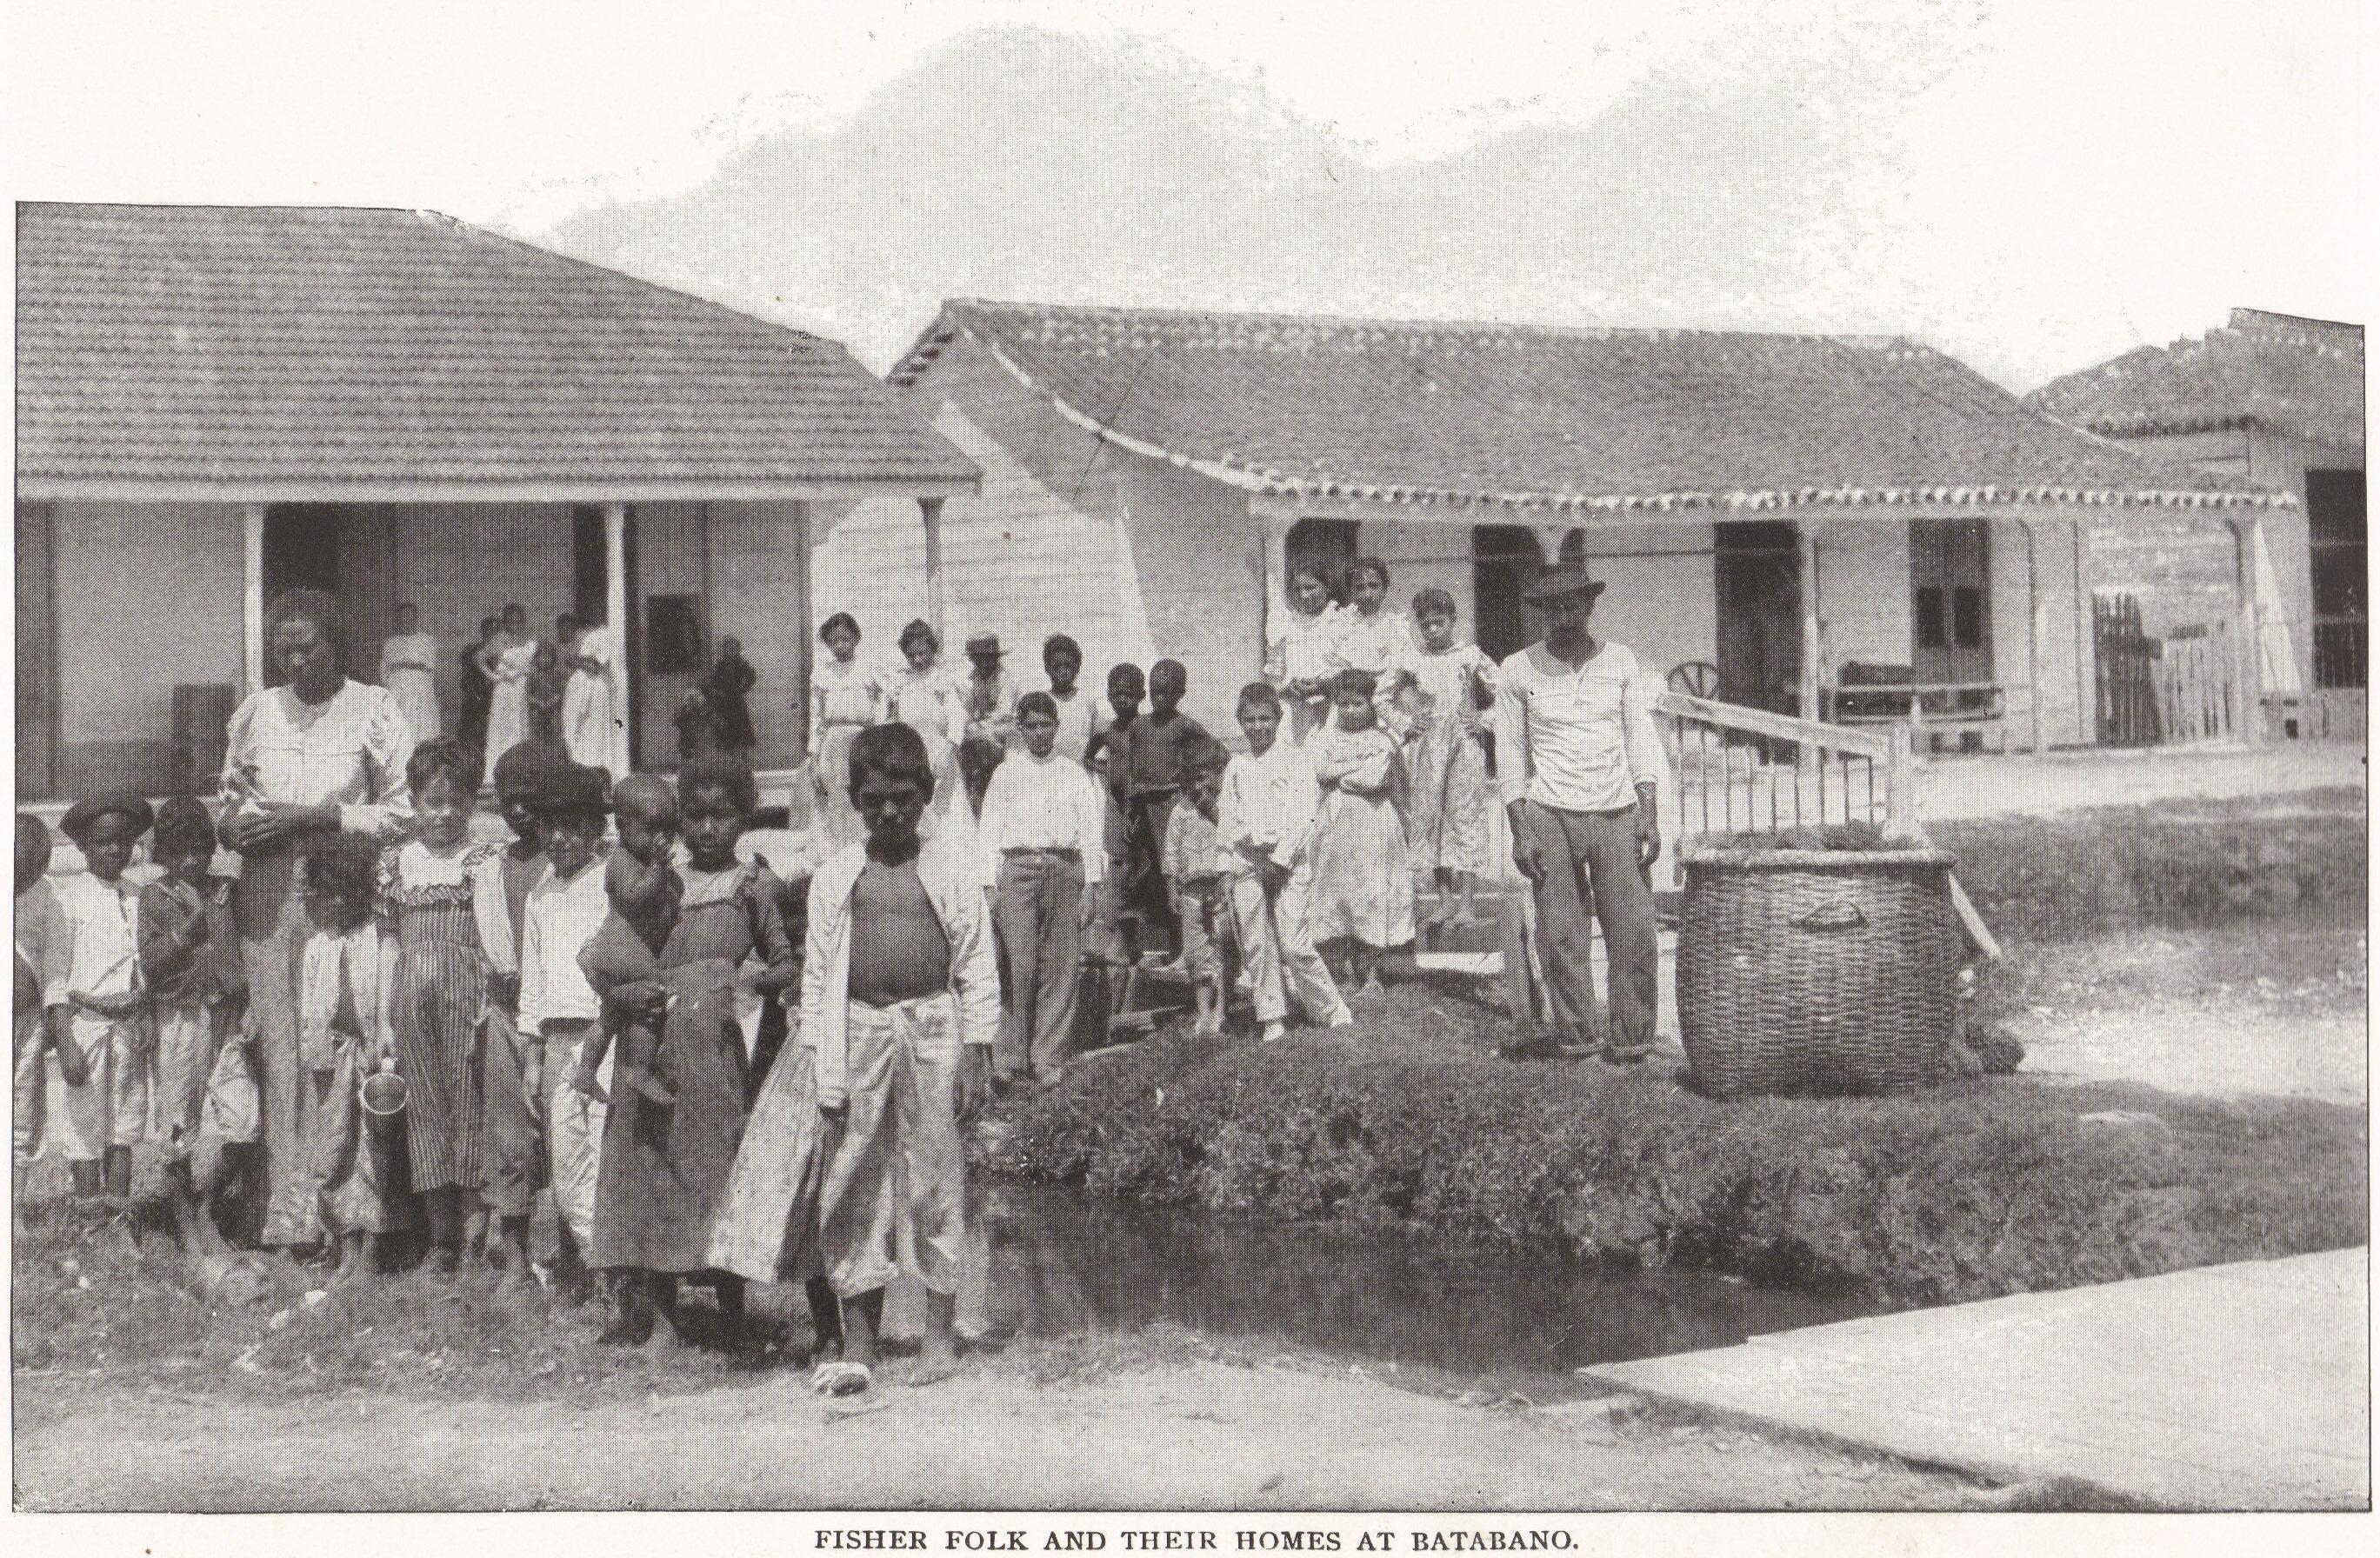 FISHER FOLK AND THEIR HOMES AT BATABANO, CUBA (1898)